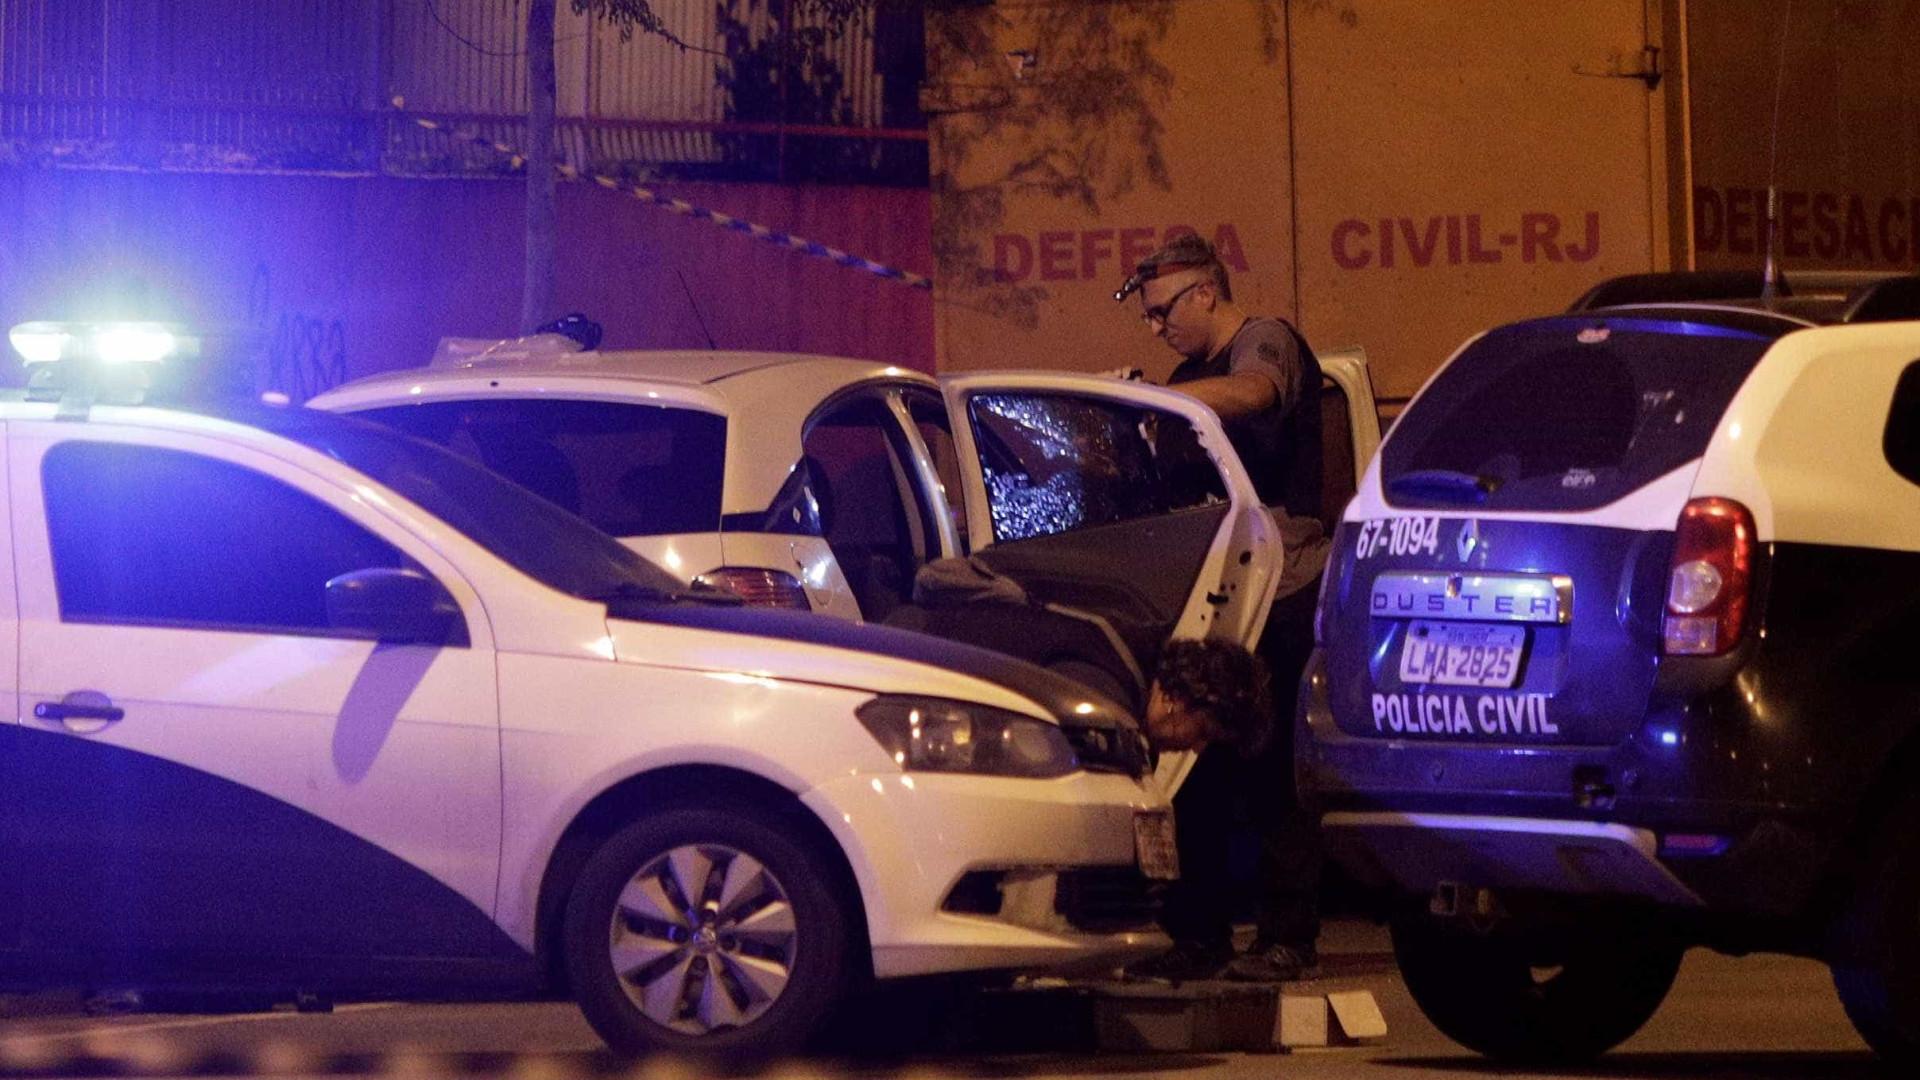 Sobrevivente de ataque contra Marielle Franco revela detalhes do crime